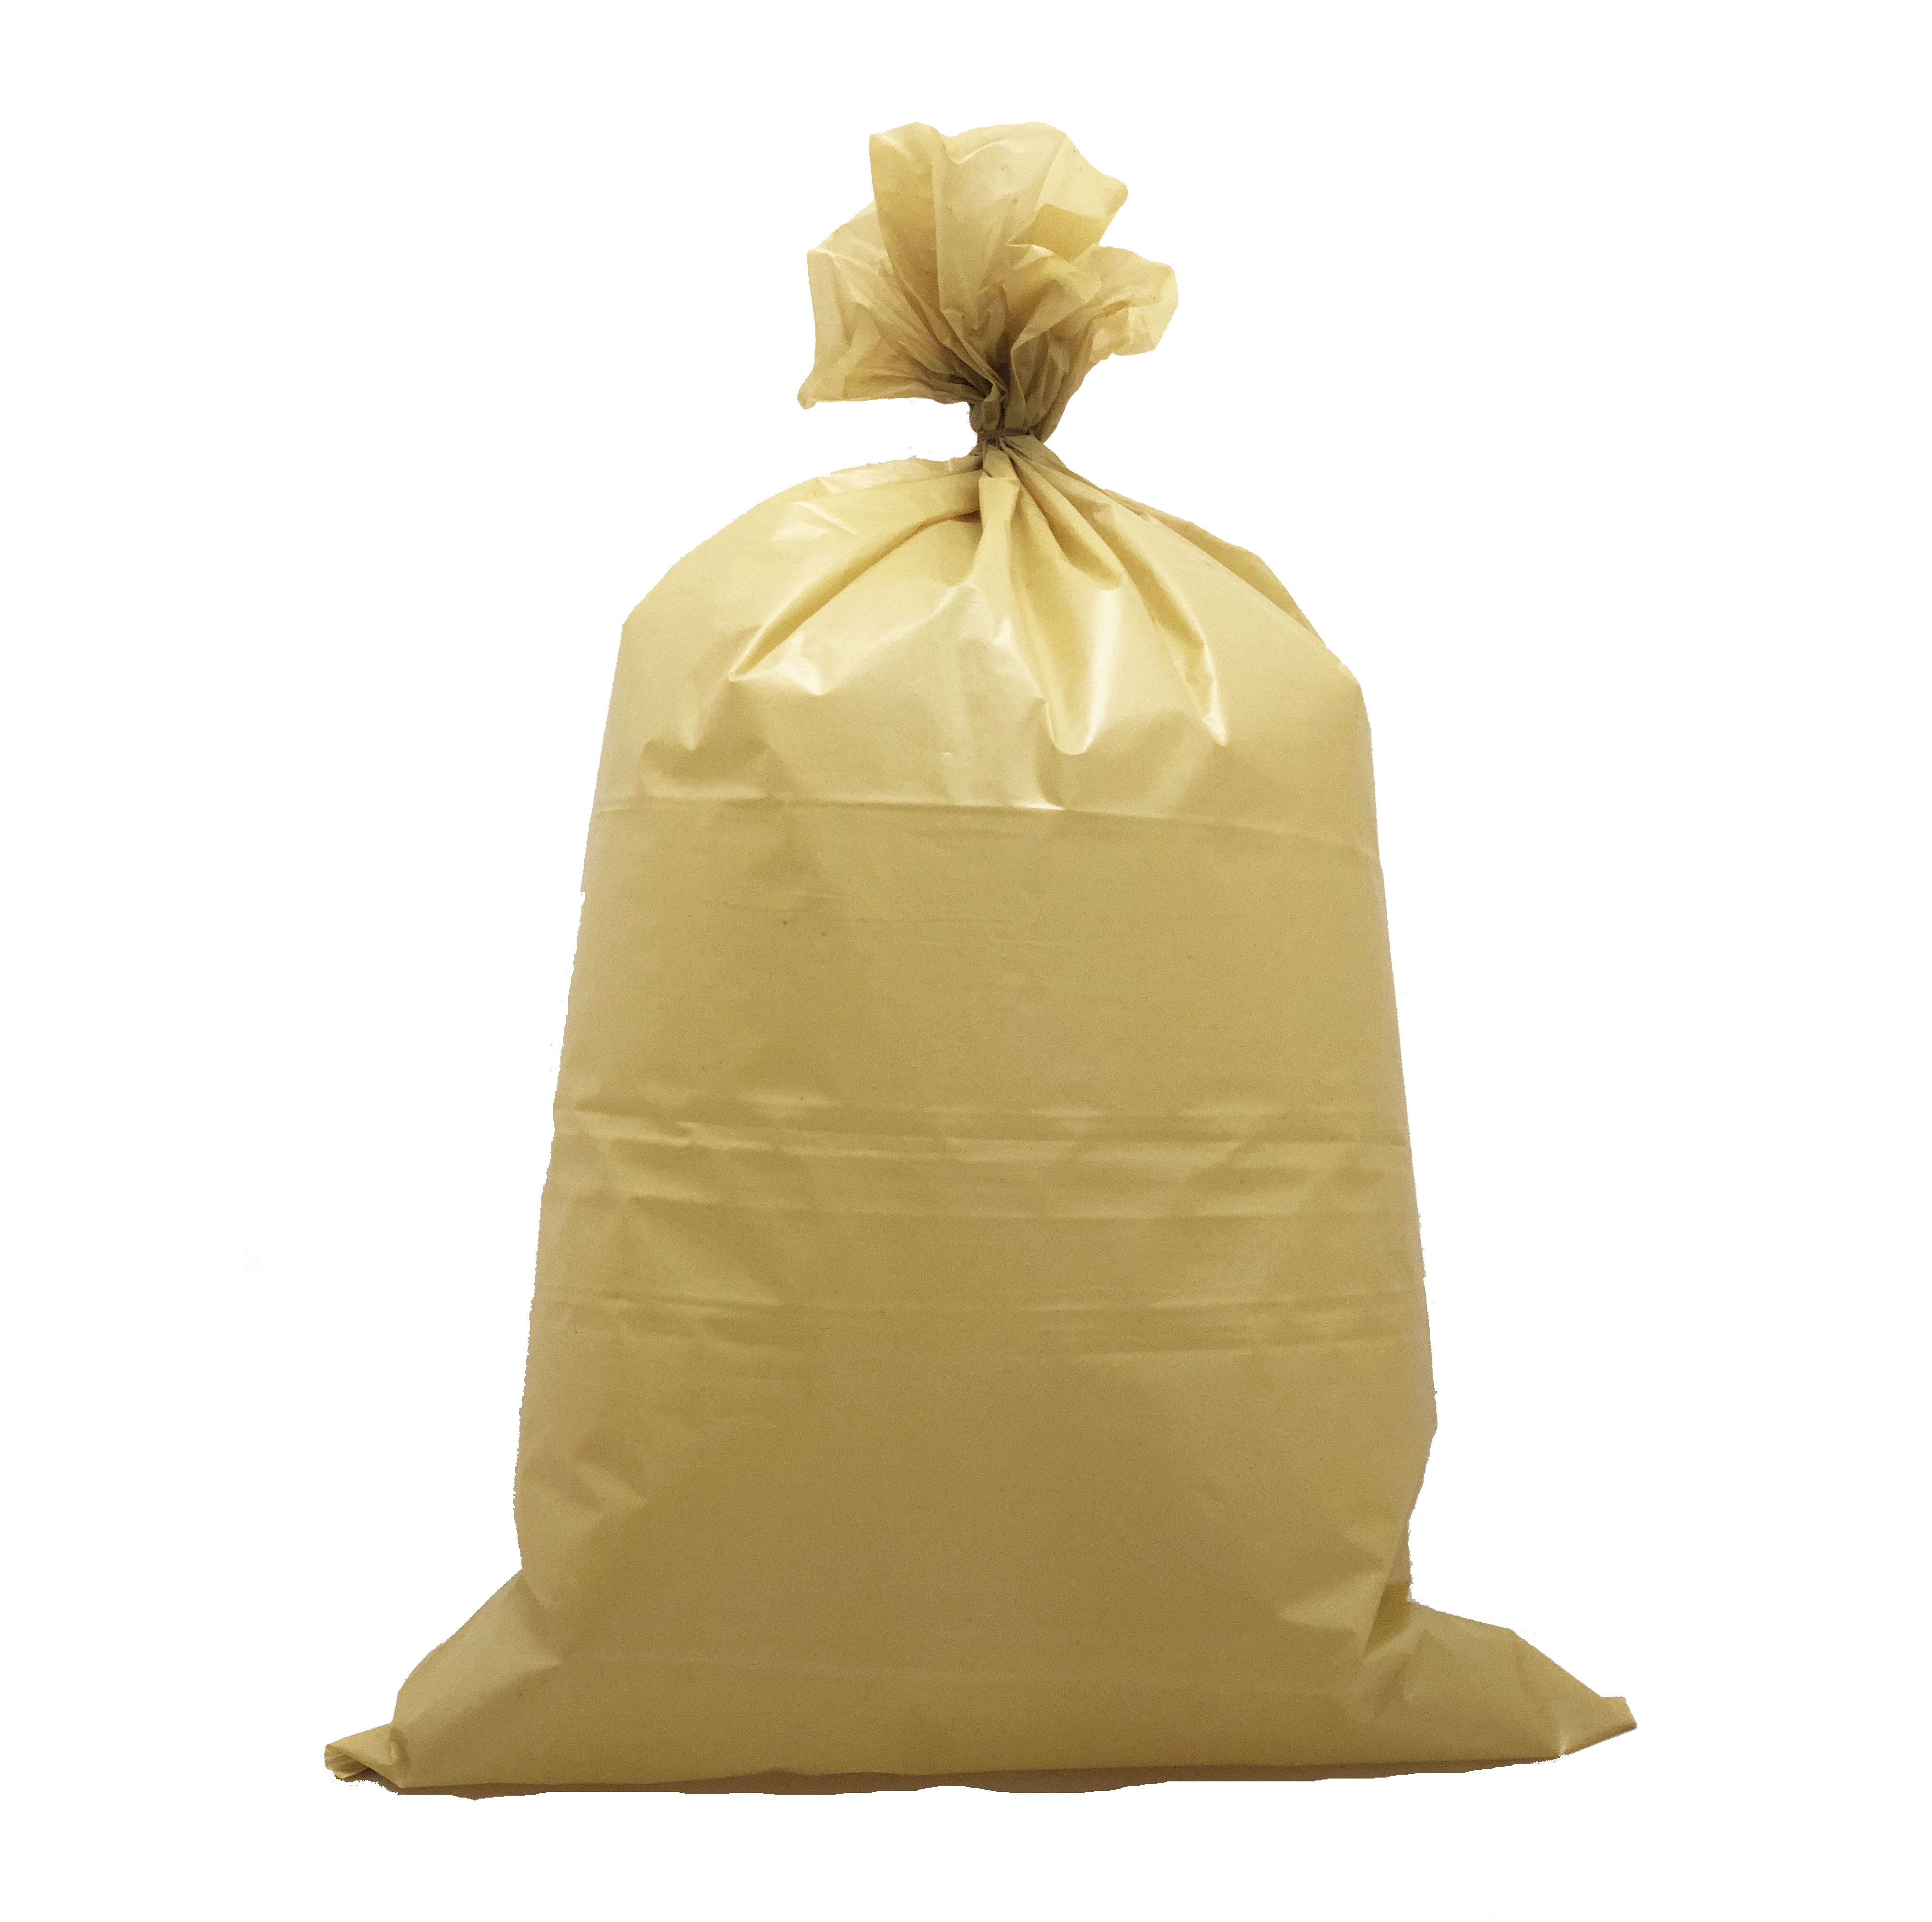 Plastik Sampah KUNING / Trash Bag TEBAL BERKUALITAS 50micron